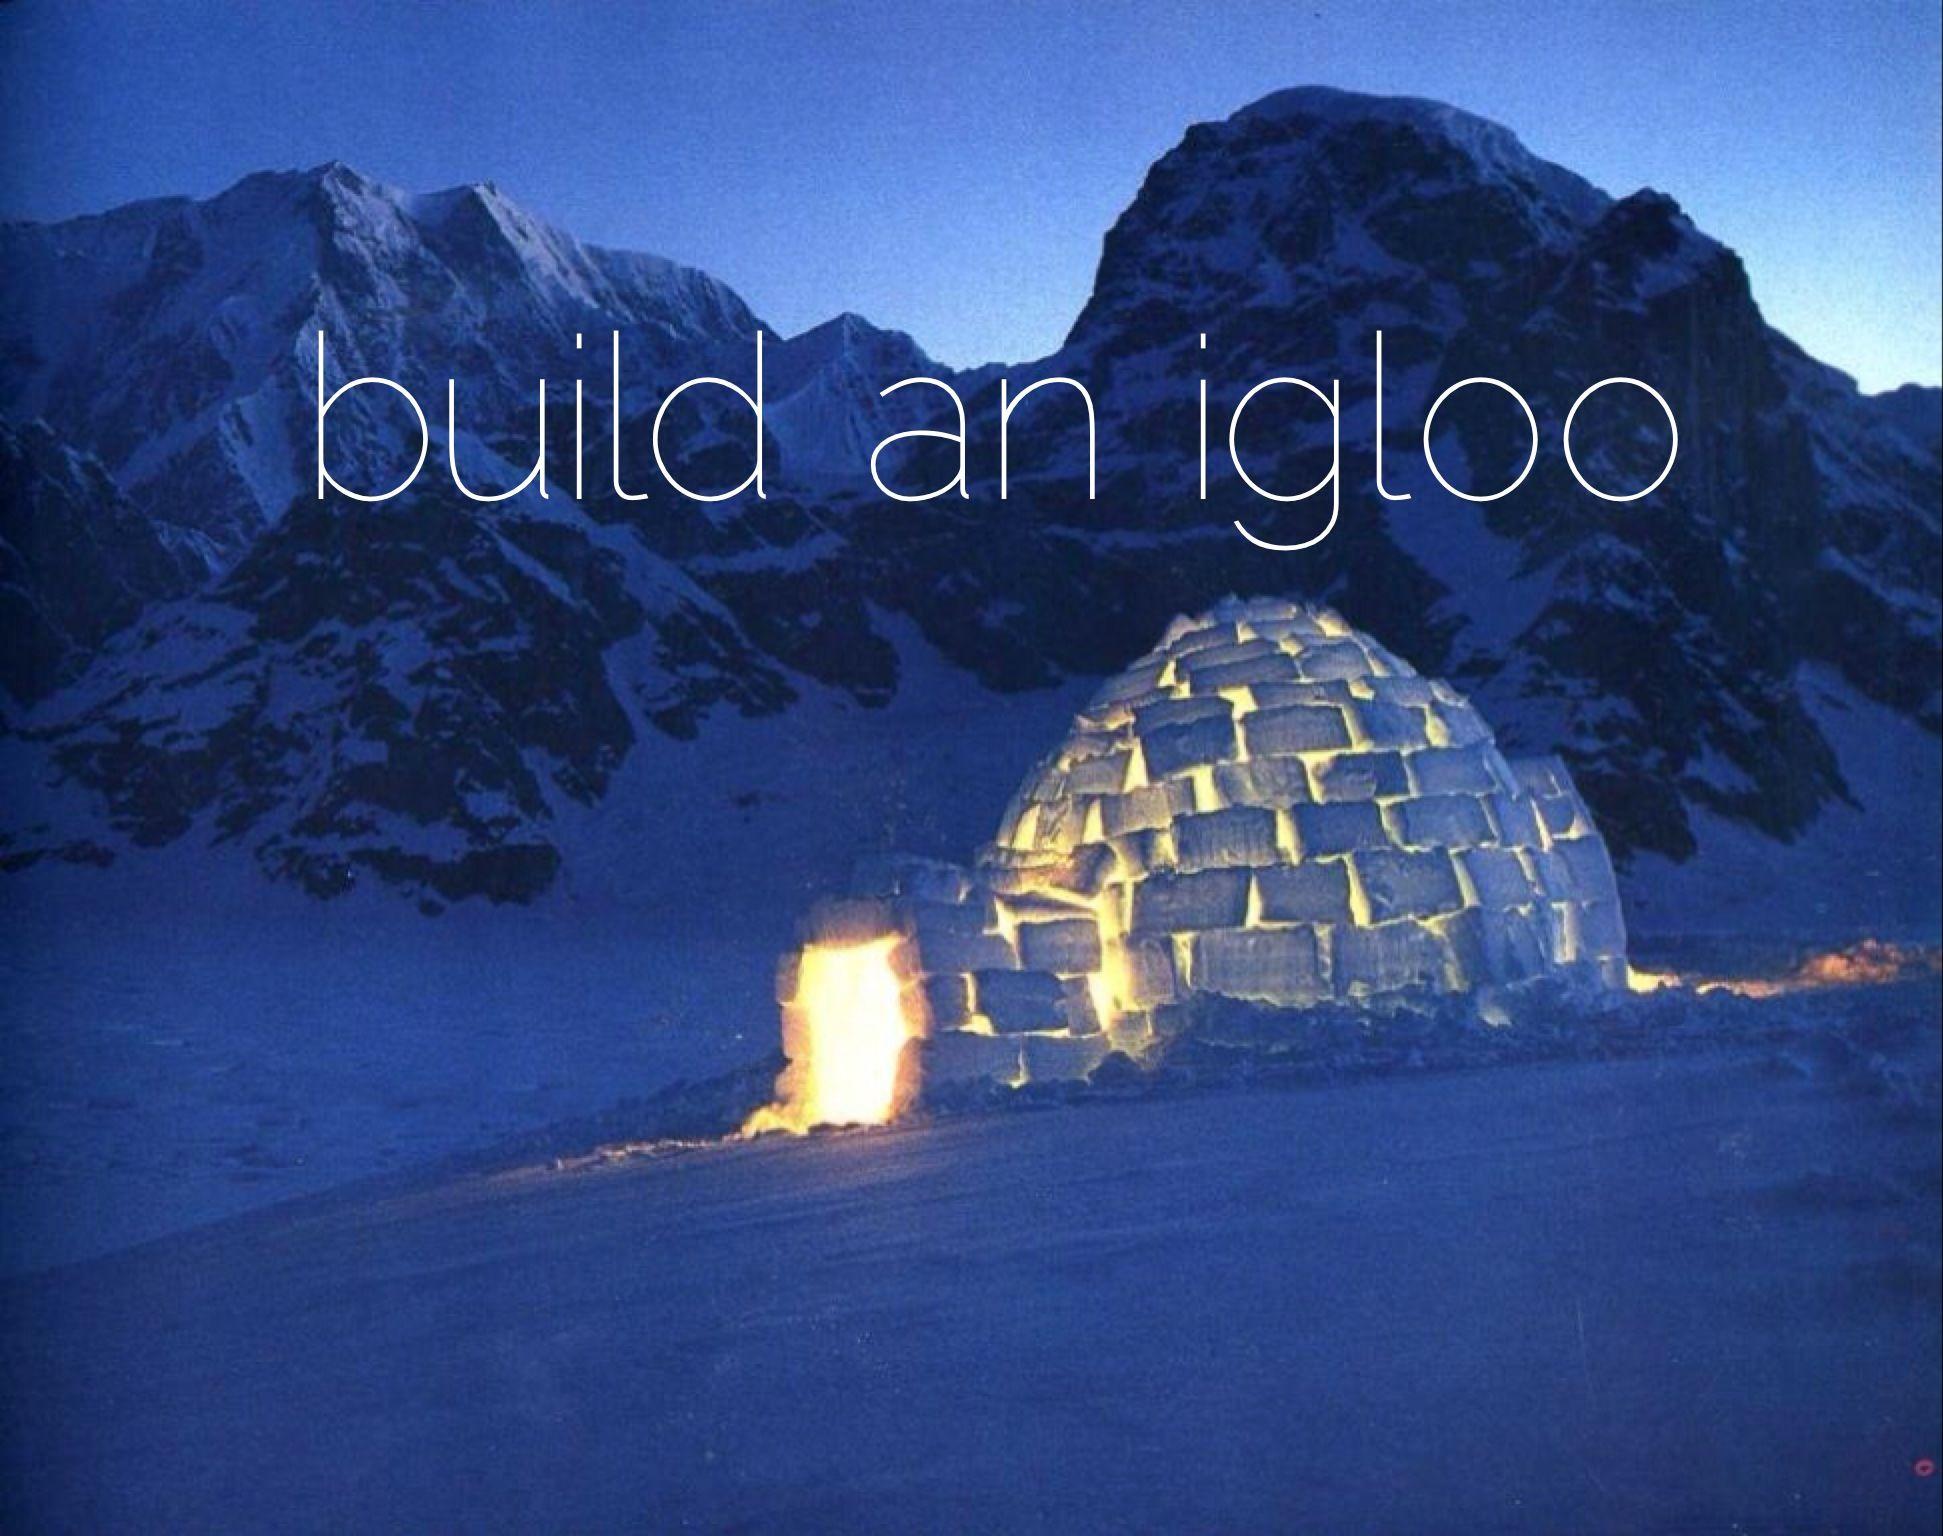 beautiful snow igloo hd wallpaper jpg image jpeg 1920 1200